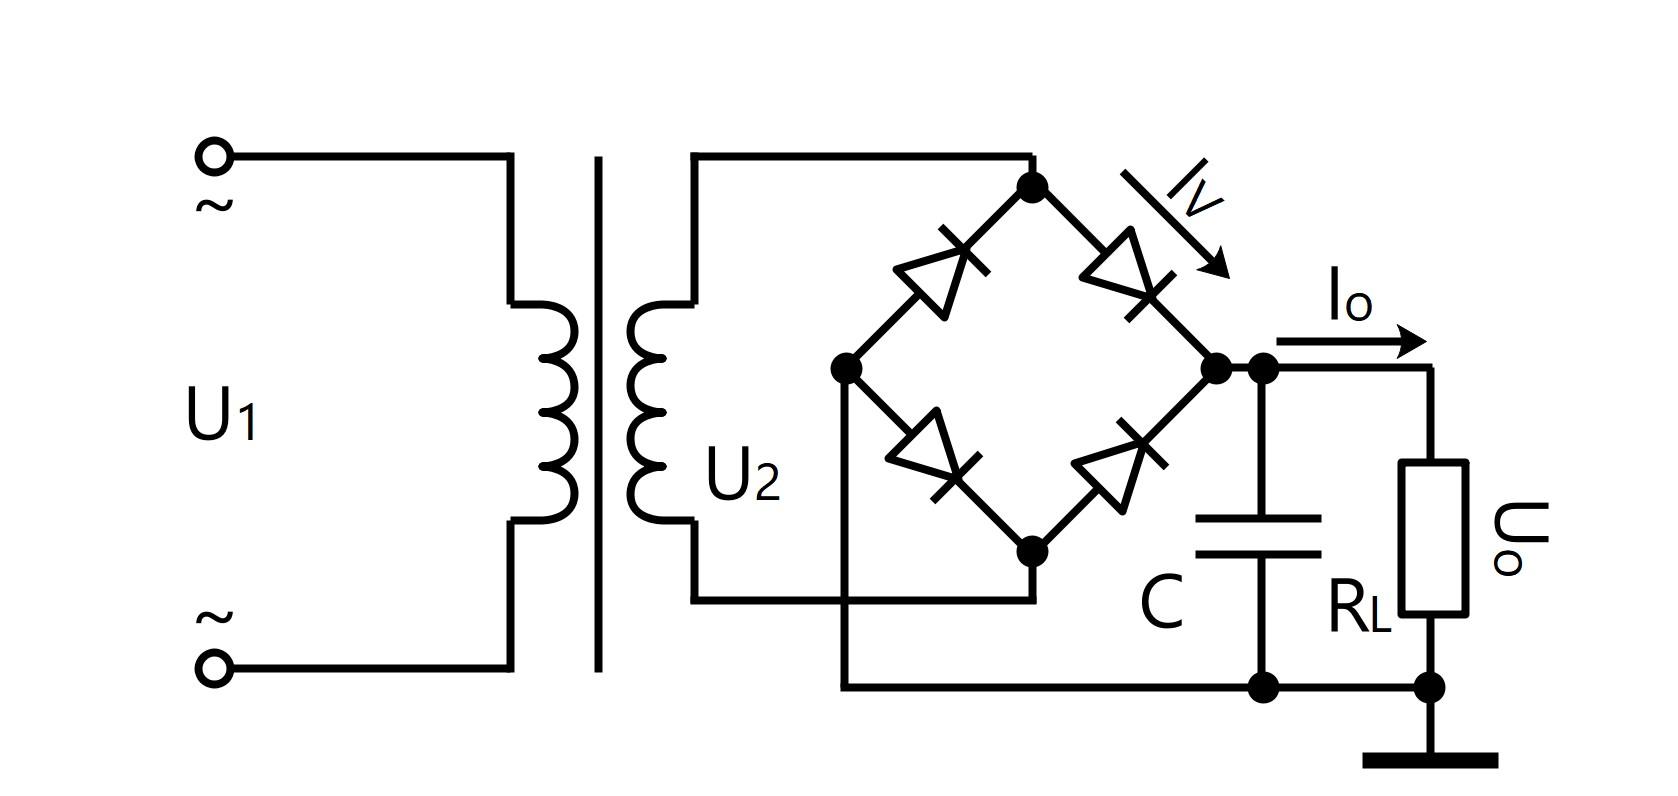 Single-Phase Bridge Rectification Filter Circuit. More details via sales@huimultd.com